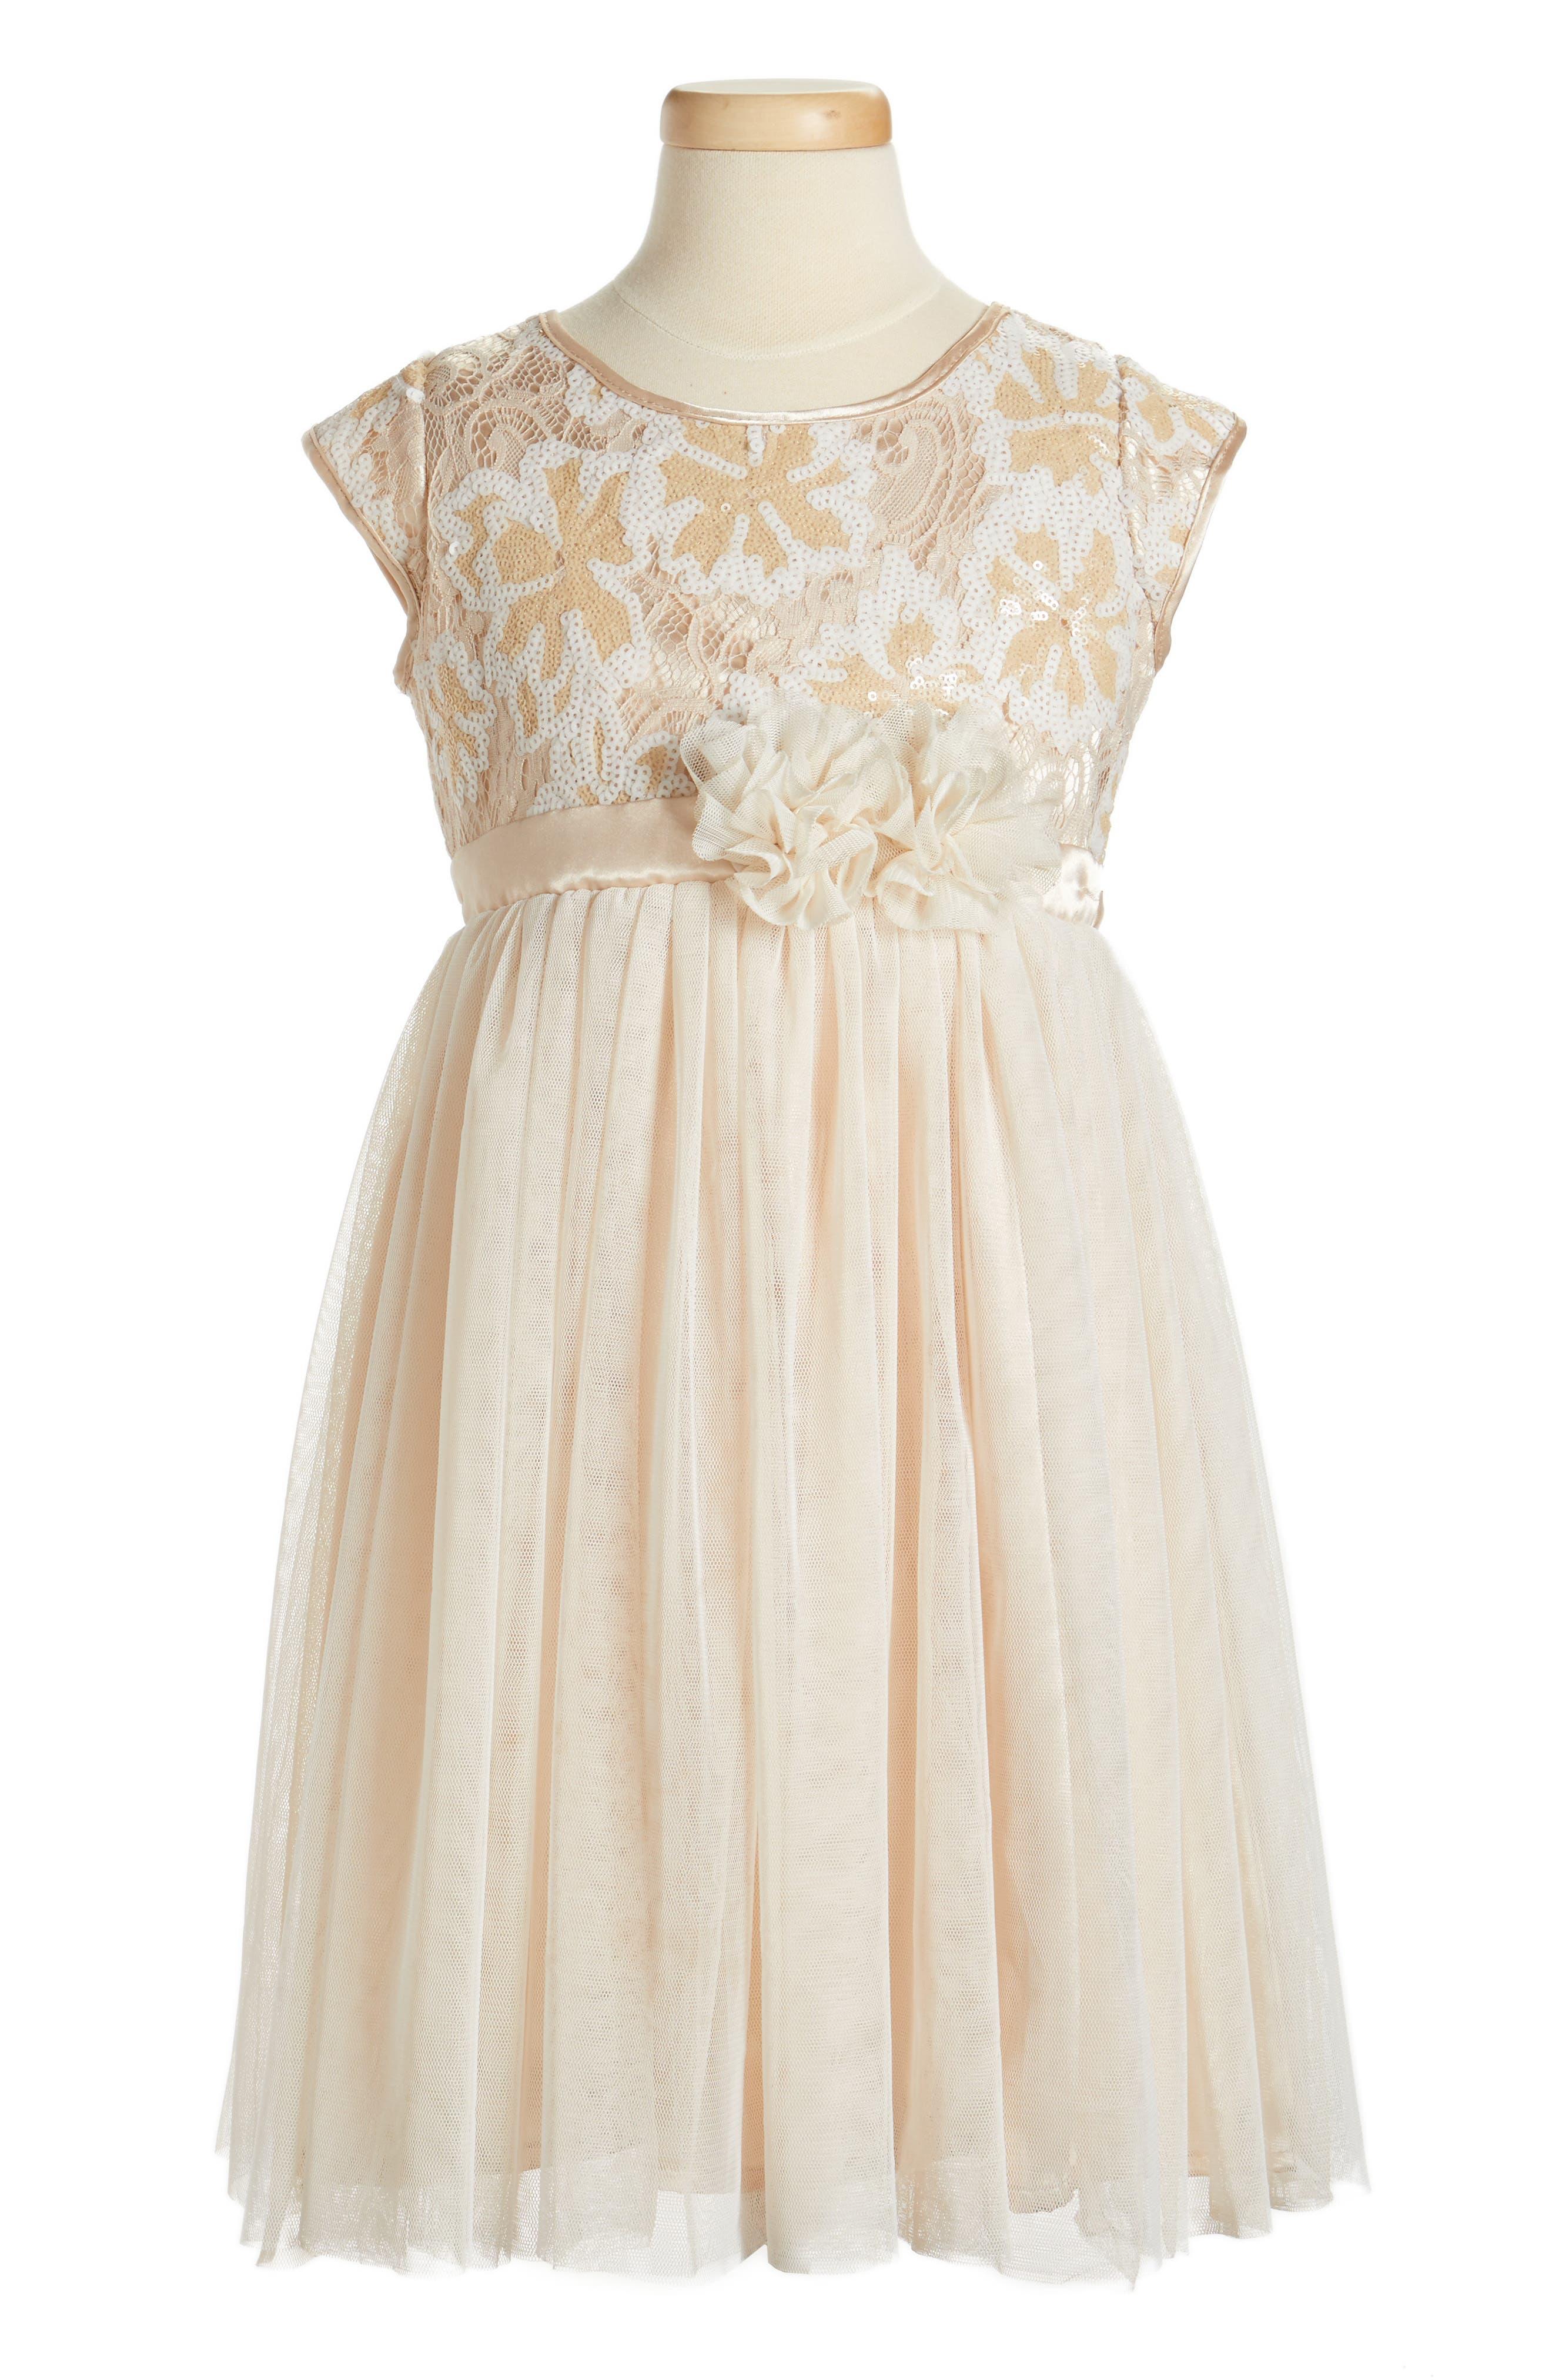 Sequin Flower Dress,                             Main thumbnail 1, color,                             Ivory